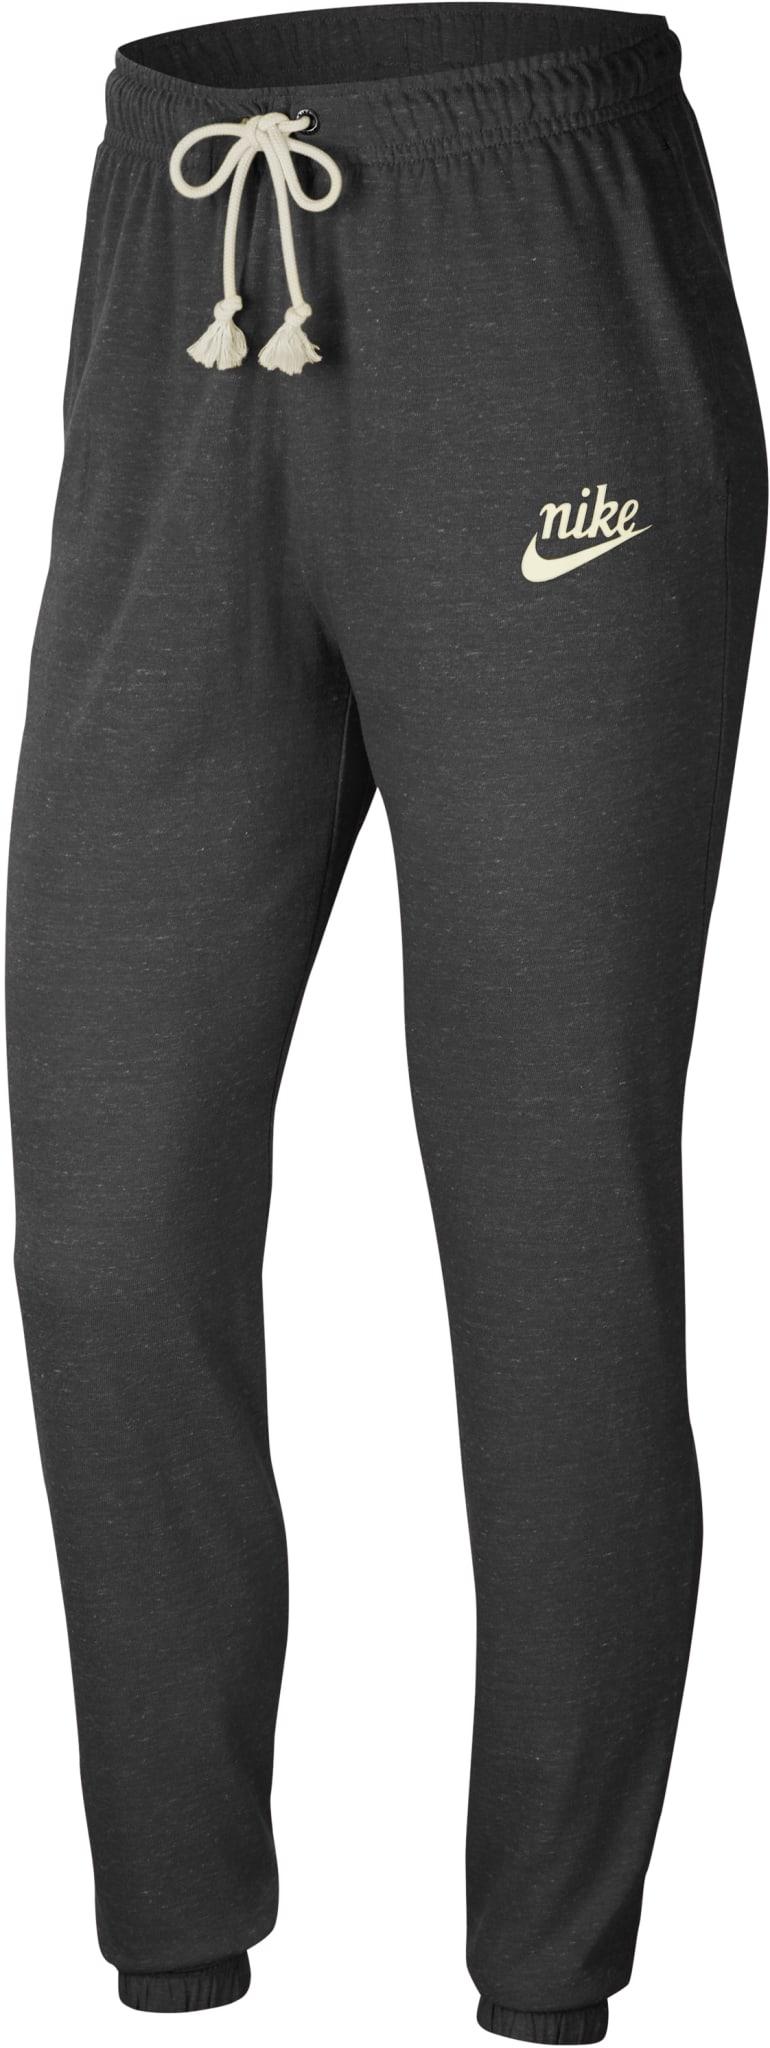 NSW Gym Vintage Pant W